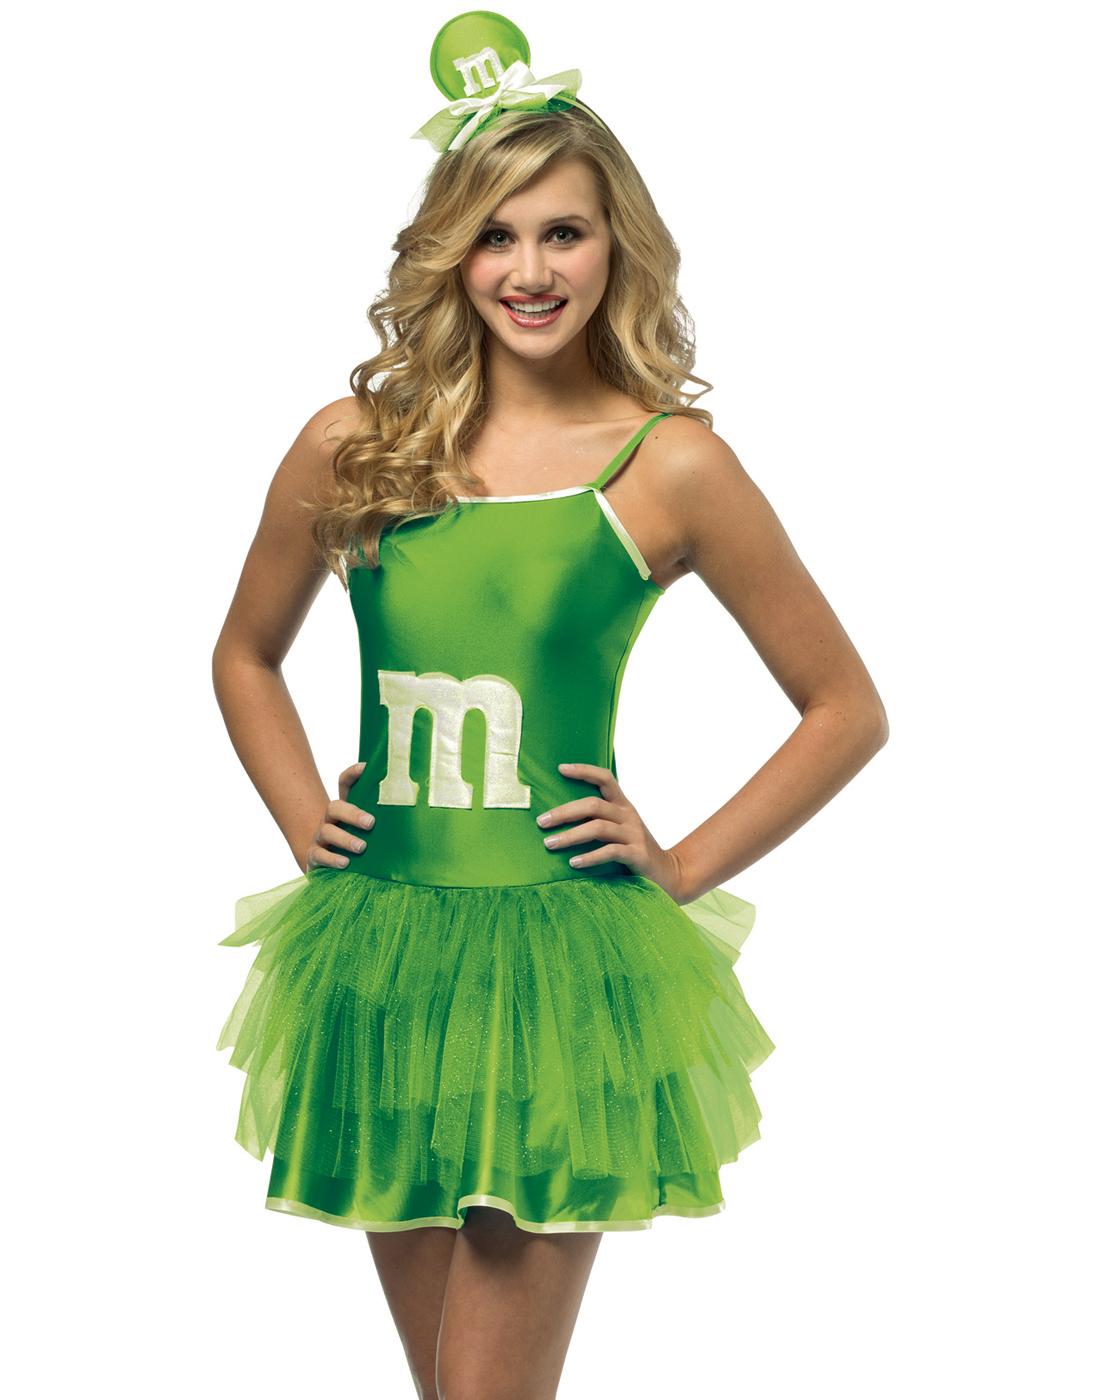 ordina online carino di buona qualità M&M Sassy Green Mini Tutu Teen Dress Up Girls Costume teen ...